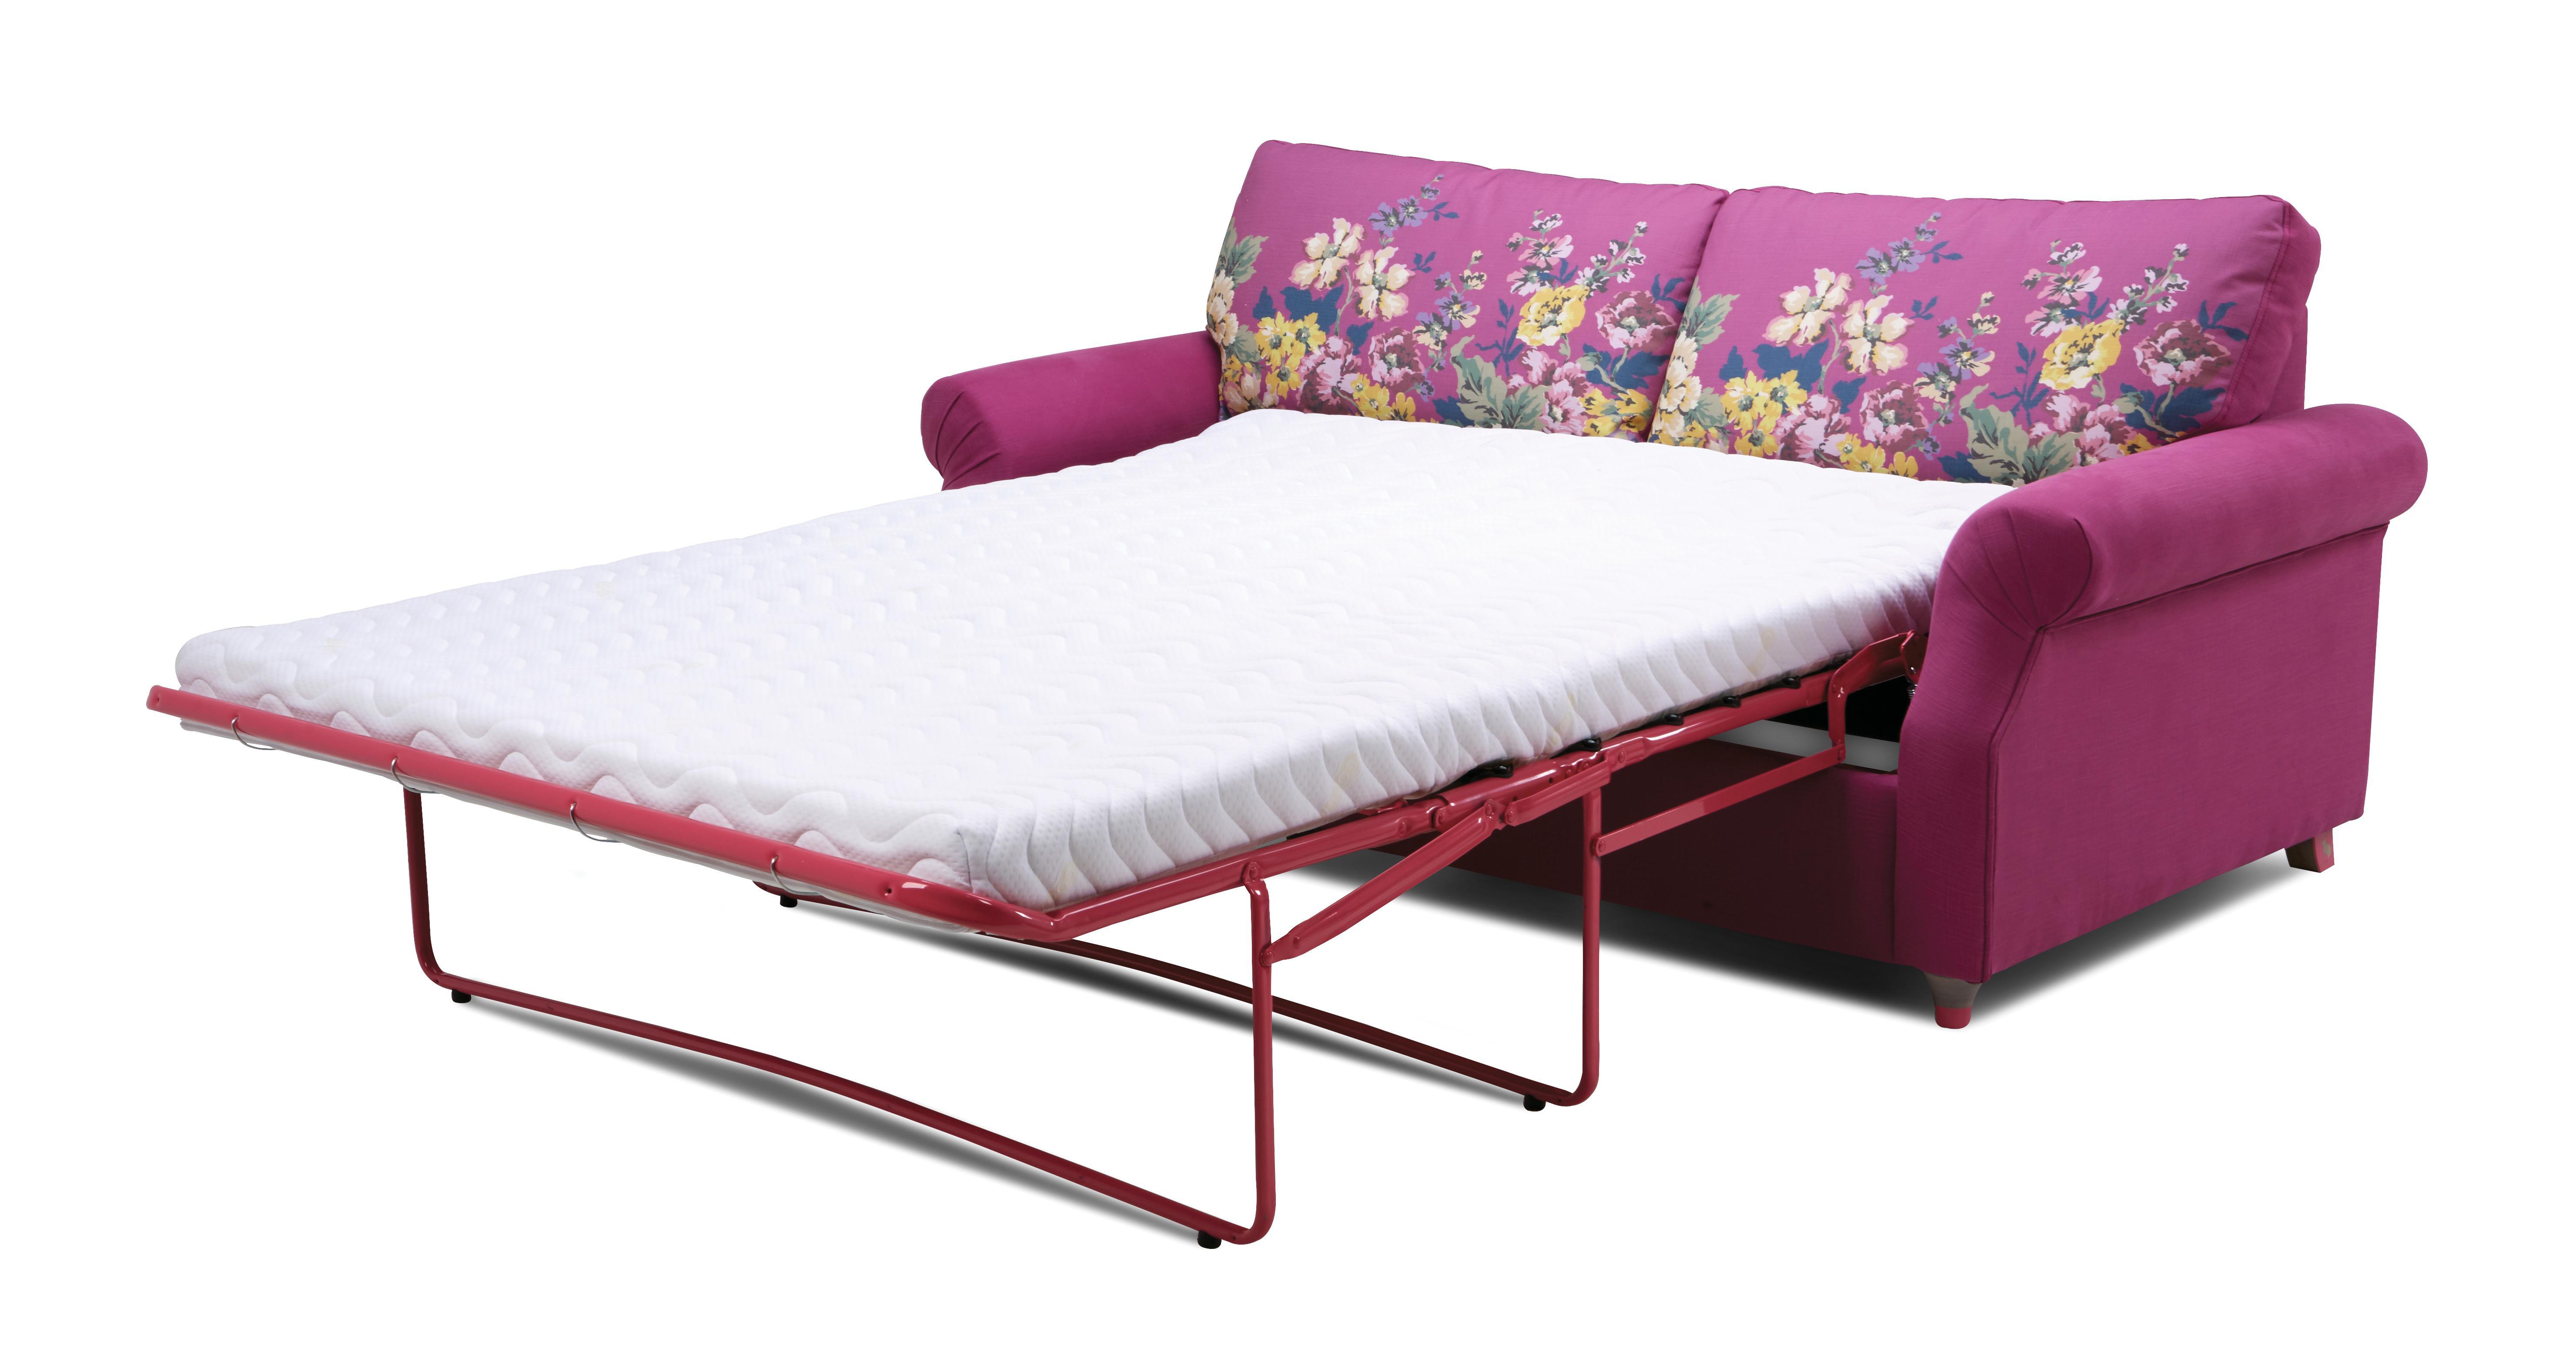 Sensational Cambridge Cotton 3 Seater Supreme Sofa Bed Andrewgaddart Wooden Chair Designs For Living Room Andrewgaddartcom